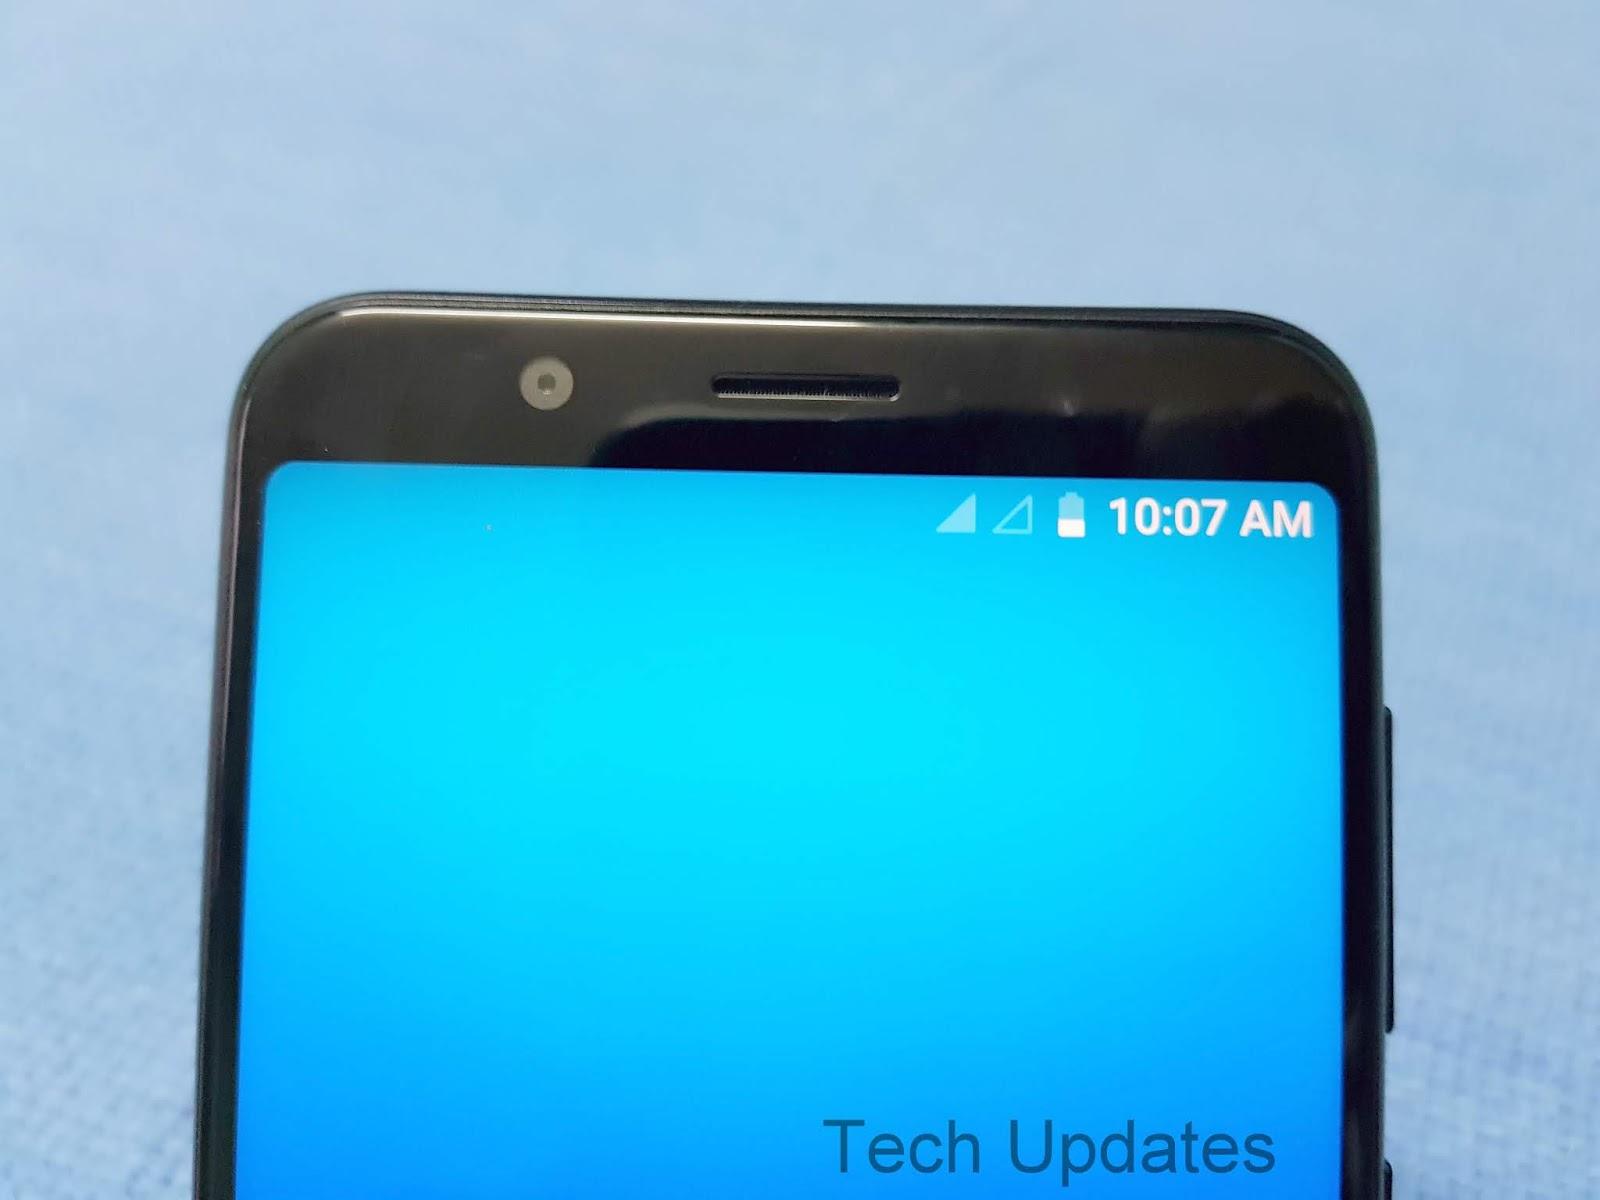 Asus Zenfone Max Pro M1 Photo Gallery - Tech Updates